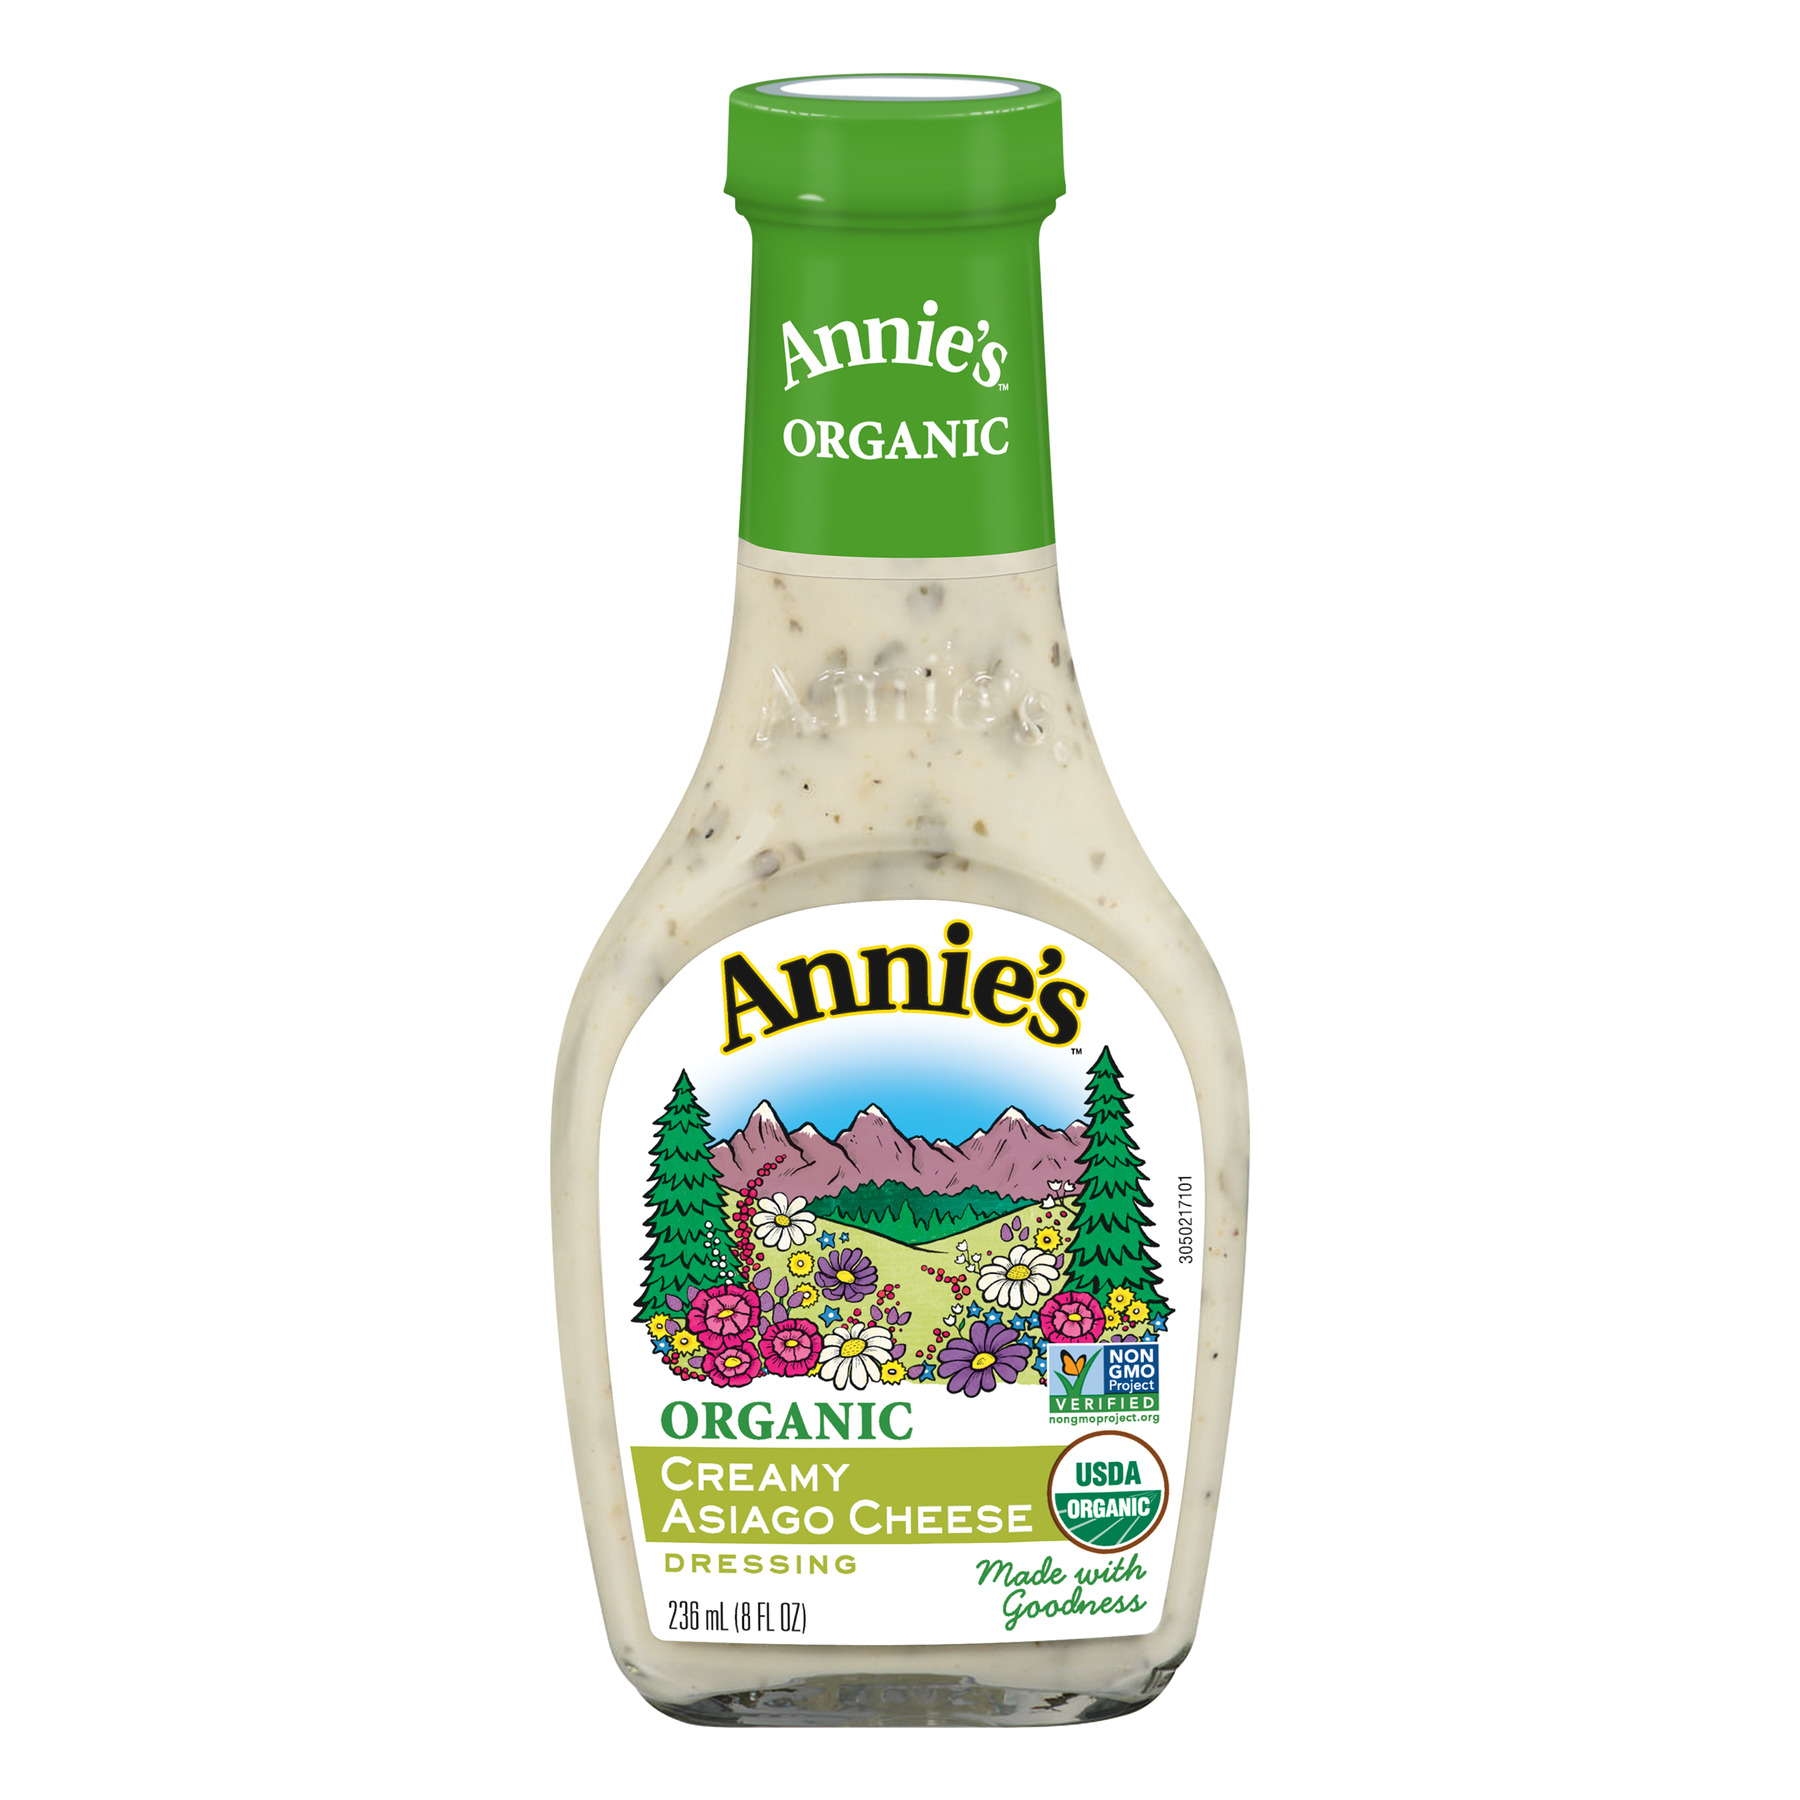 Annie's Organic Creamy Asiago Cheese Dressing, 8 fl oz